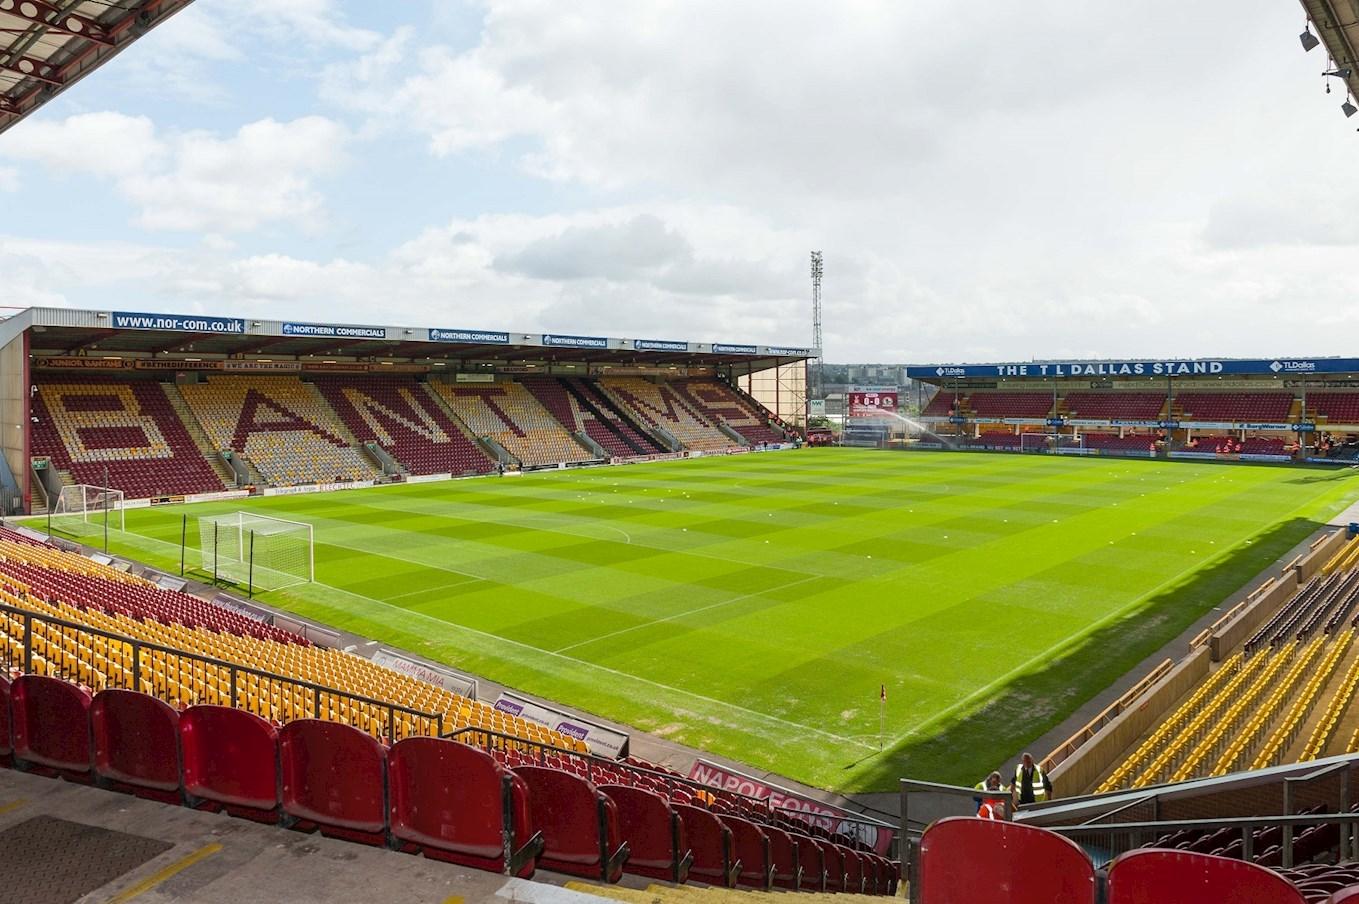 CITY TO HOST SECOND-ROUND REPLAY - News - Bradford City